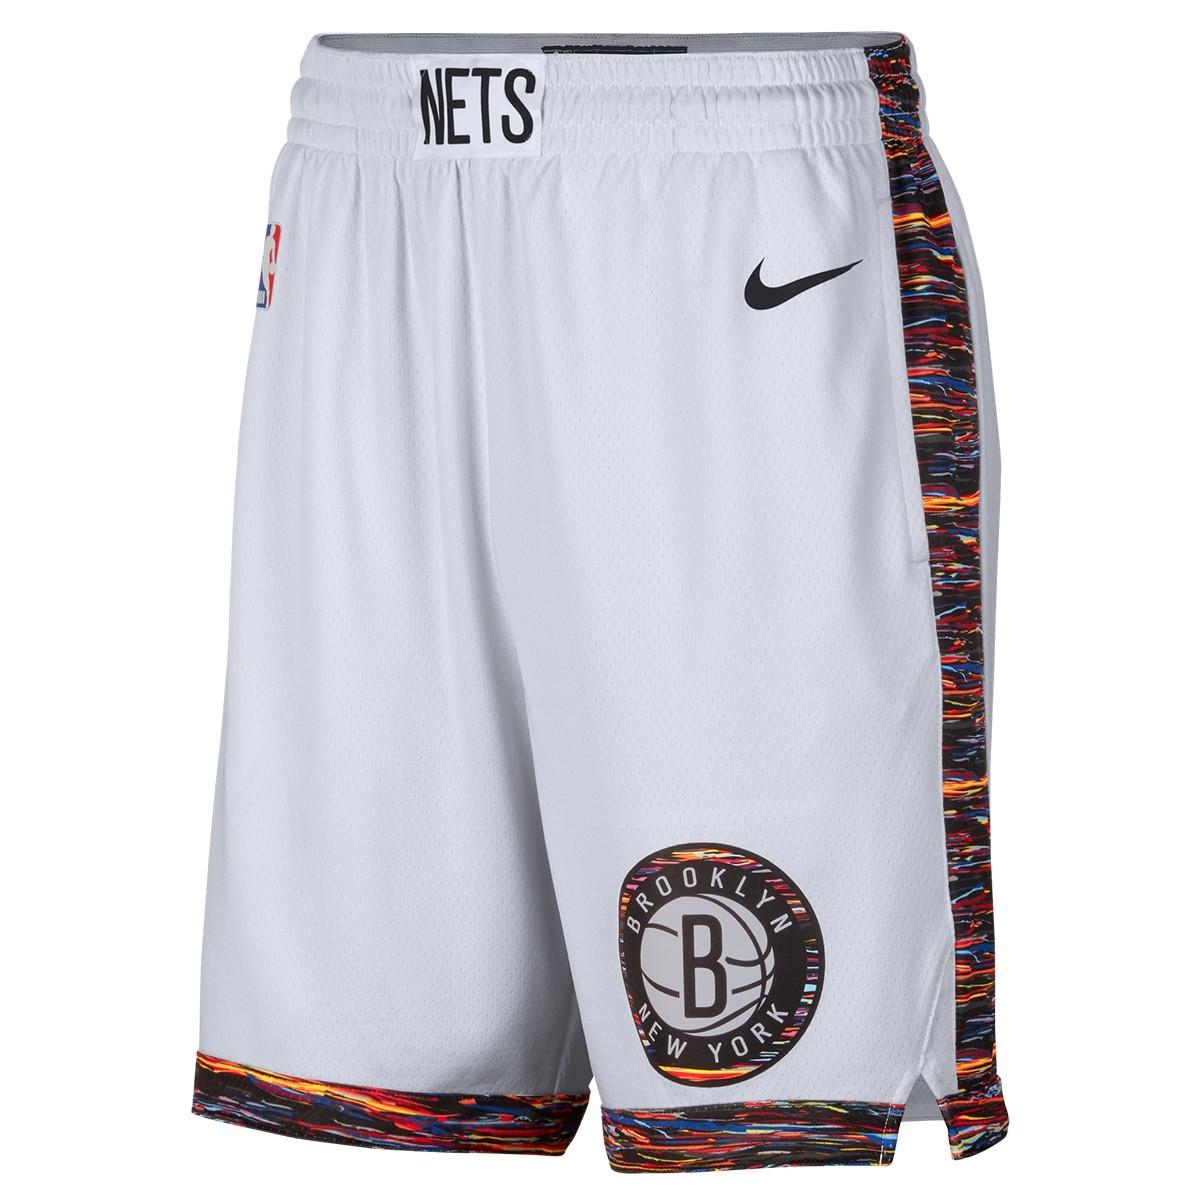 Nike Junior NBA Brooklyn Nets Swingman Short 'City Edition'